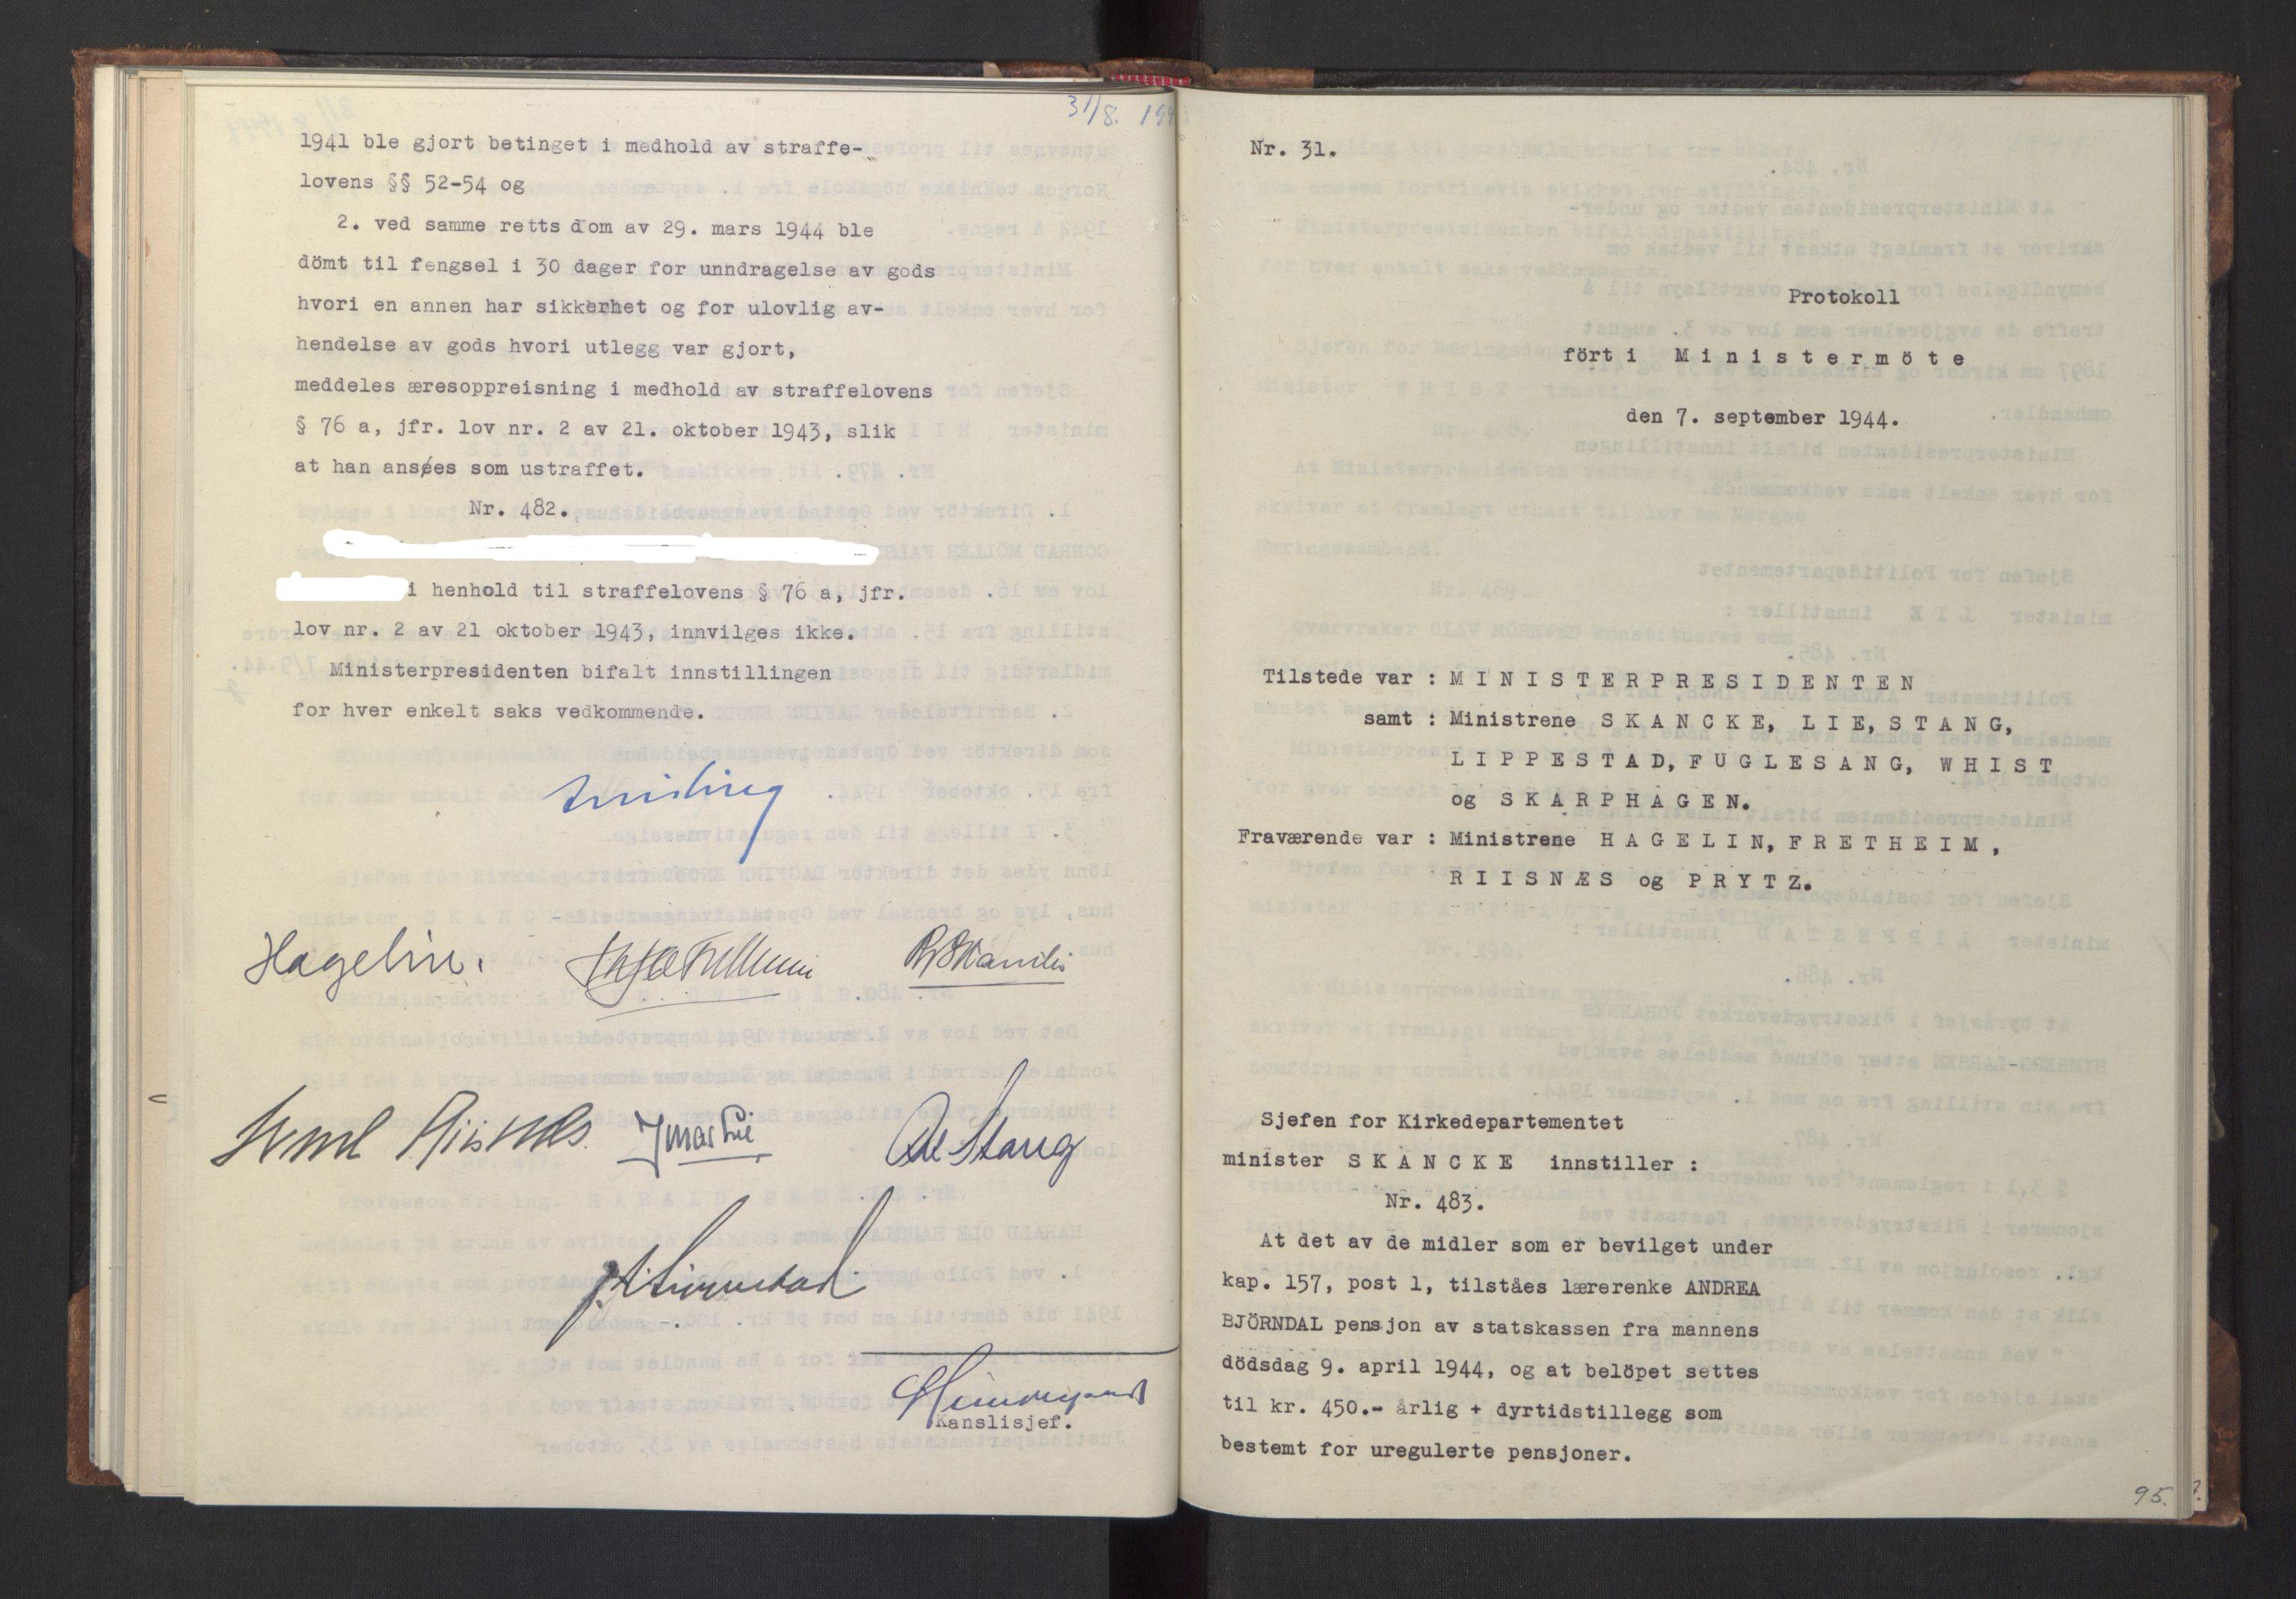 RA, NS-administrasjonen 1940-1945 (Statsrådsekretariatet, de kommisariske statsråder mm), D/Da/L0005: Protokoll fra ministermøter, 1944, s. 94b-95a